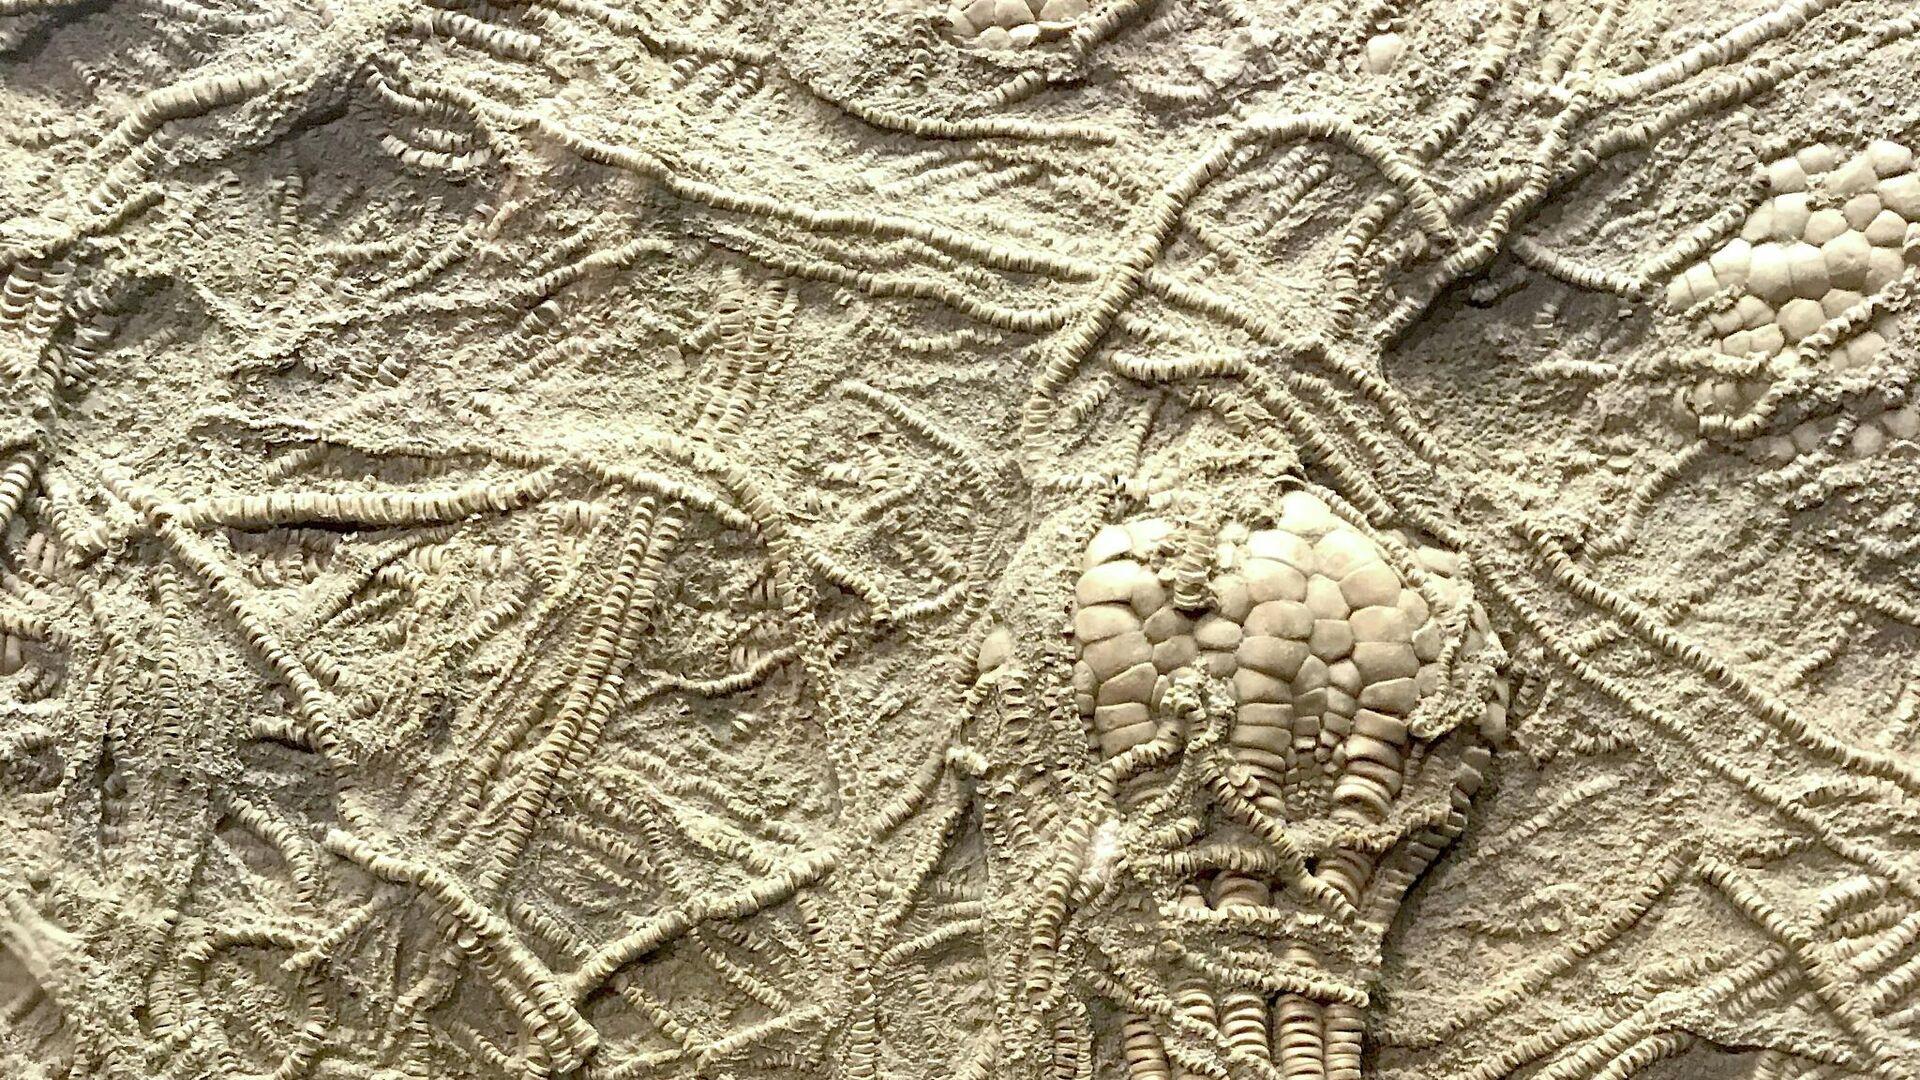 Fósiles, imagen ilustrativa - Sputnik Mundo, 1920, 25.07.2021